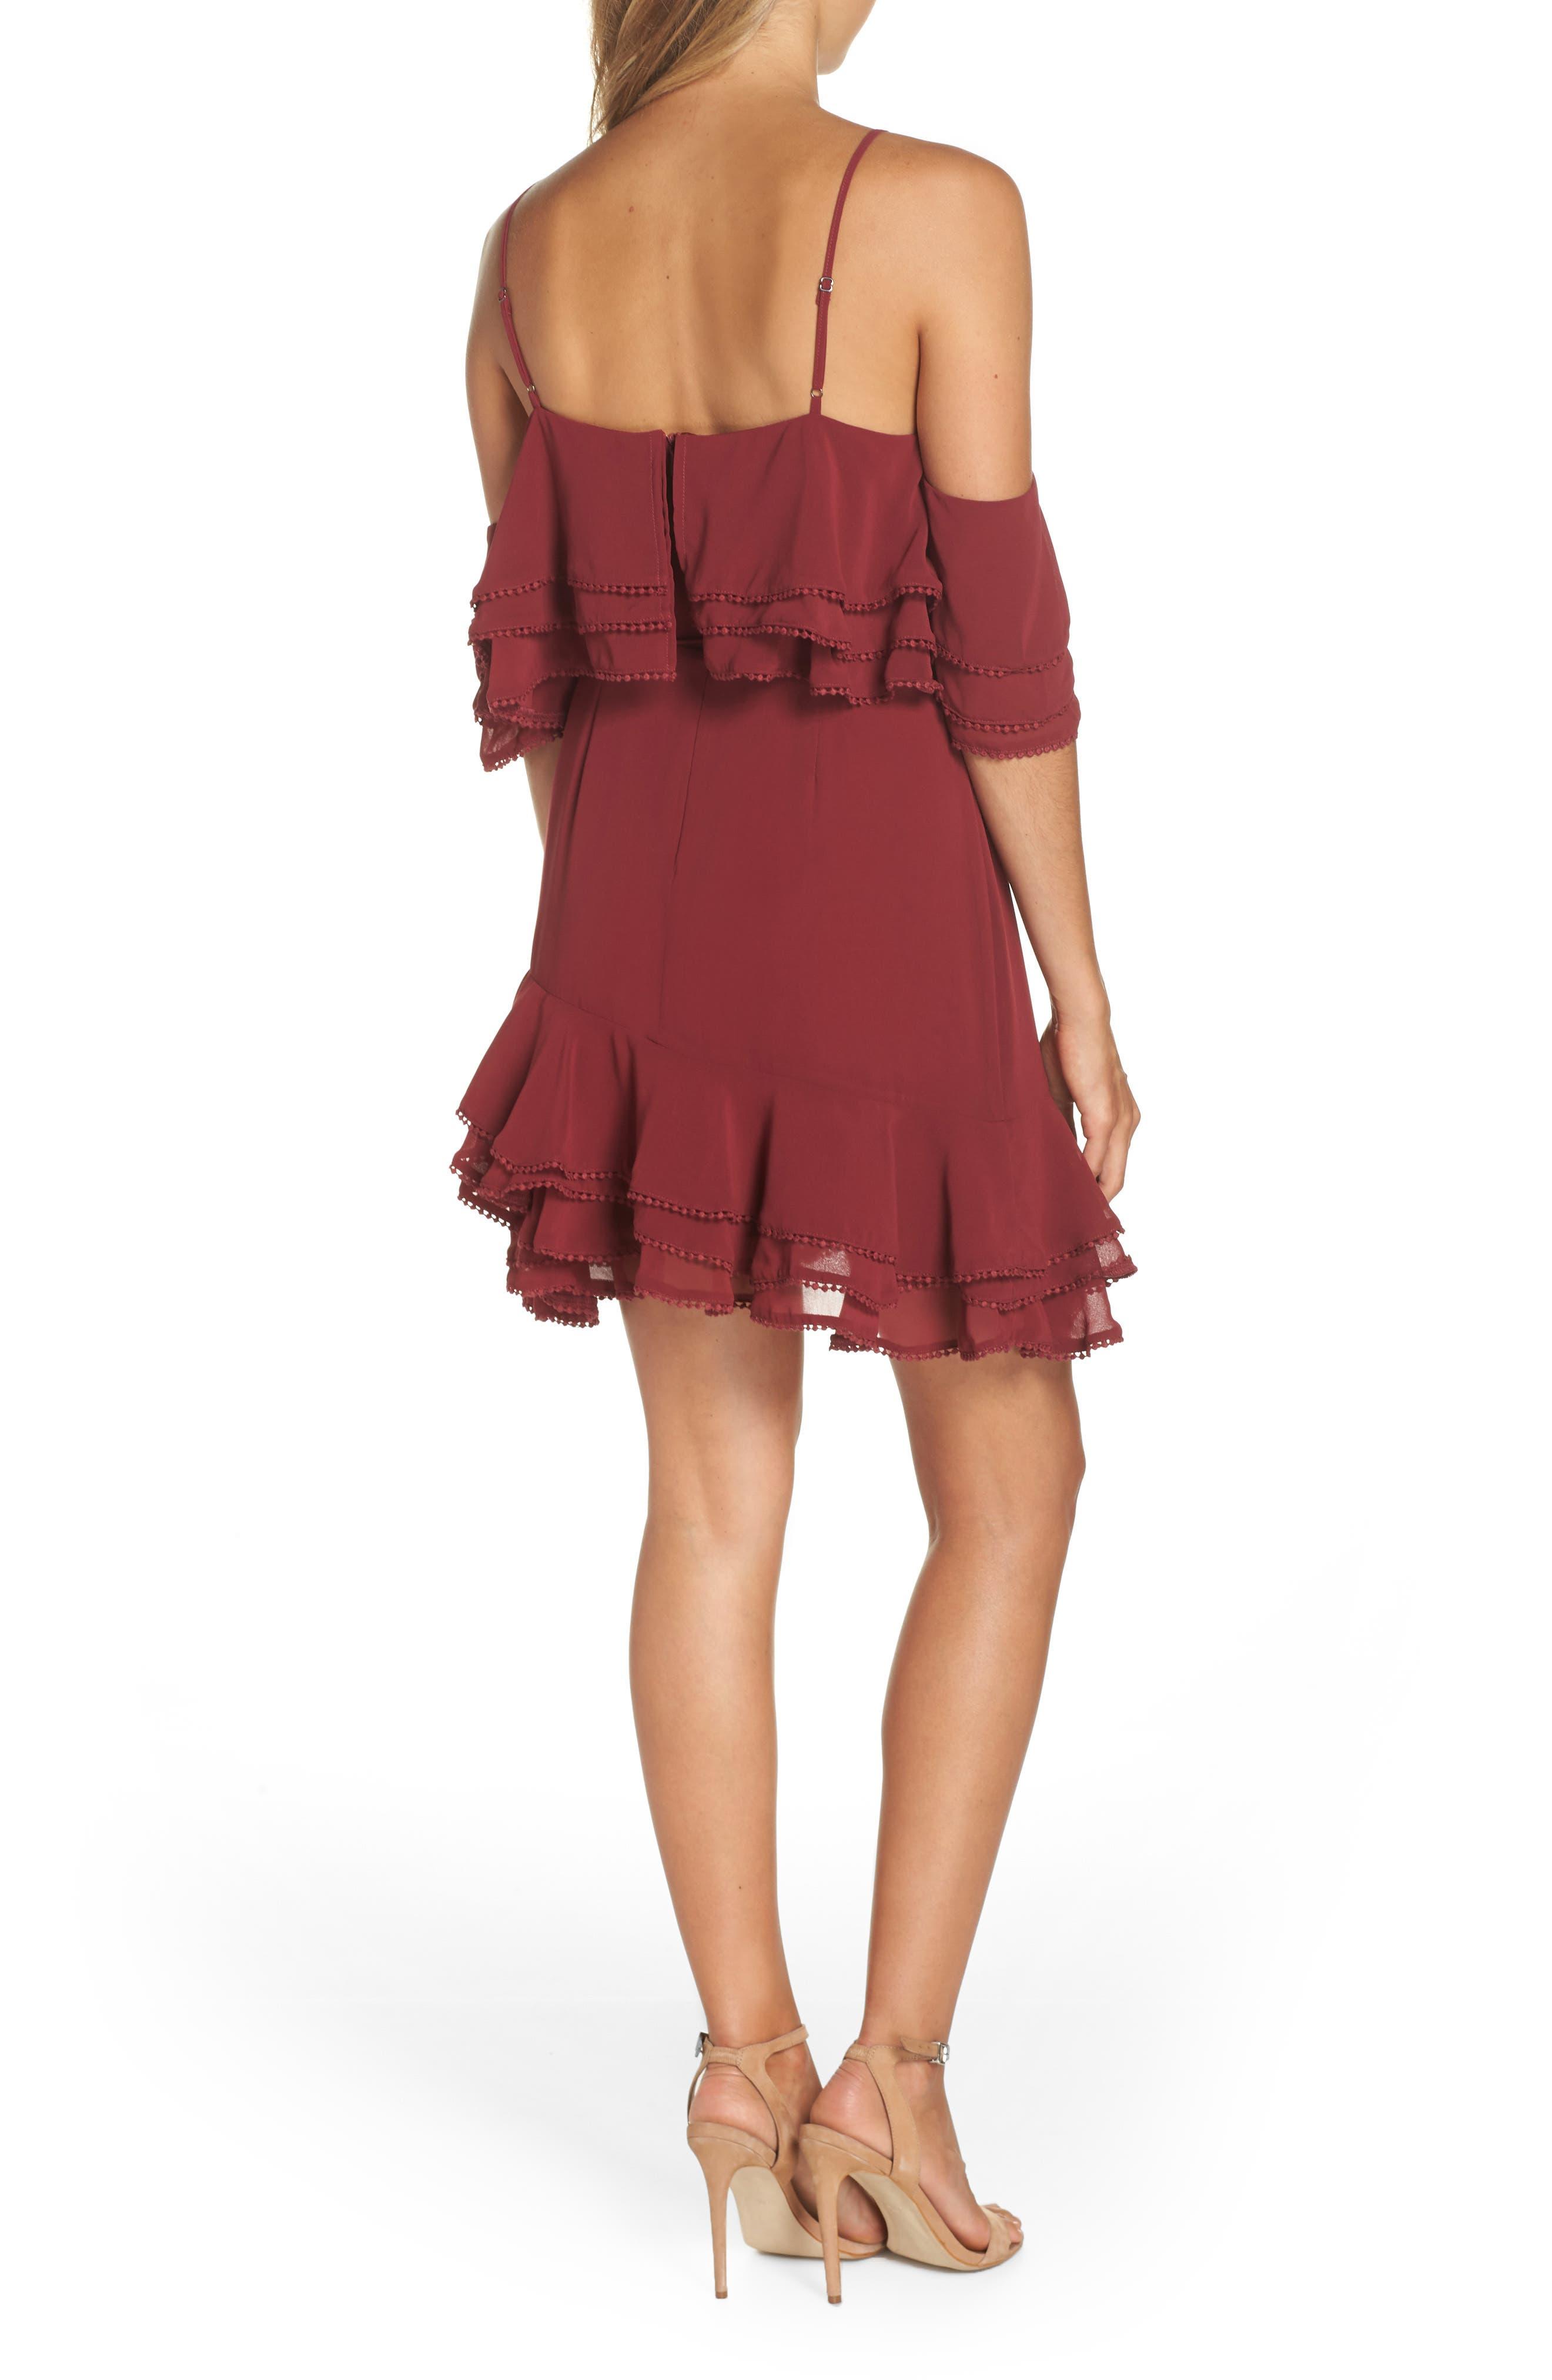 BB DAKOTA, Up All Night Layered Cold Shoulder Dress, Alternate thumbnail 2, color, 930